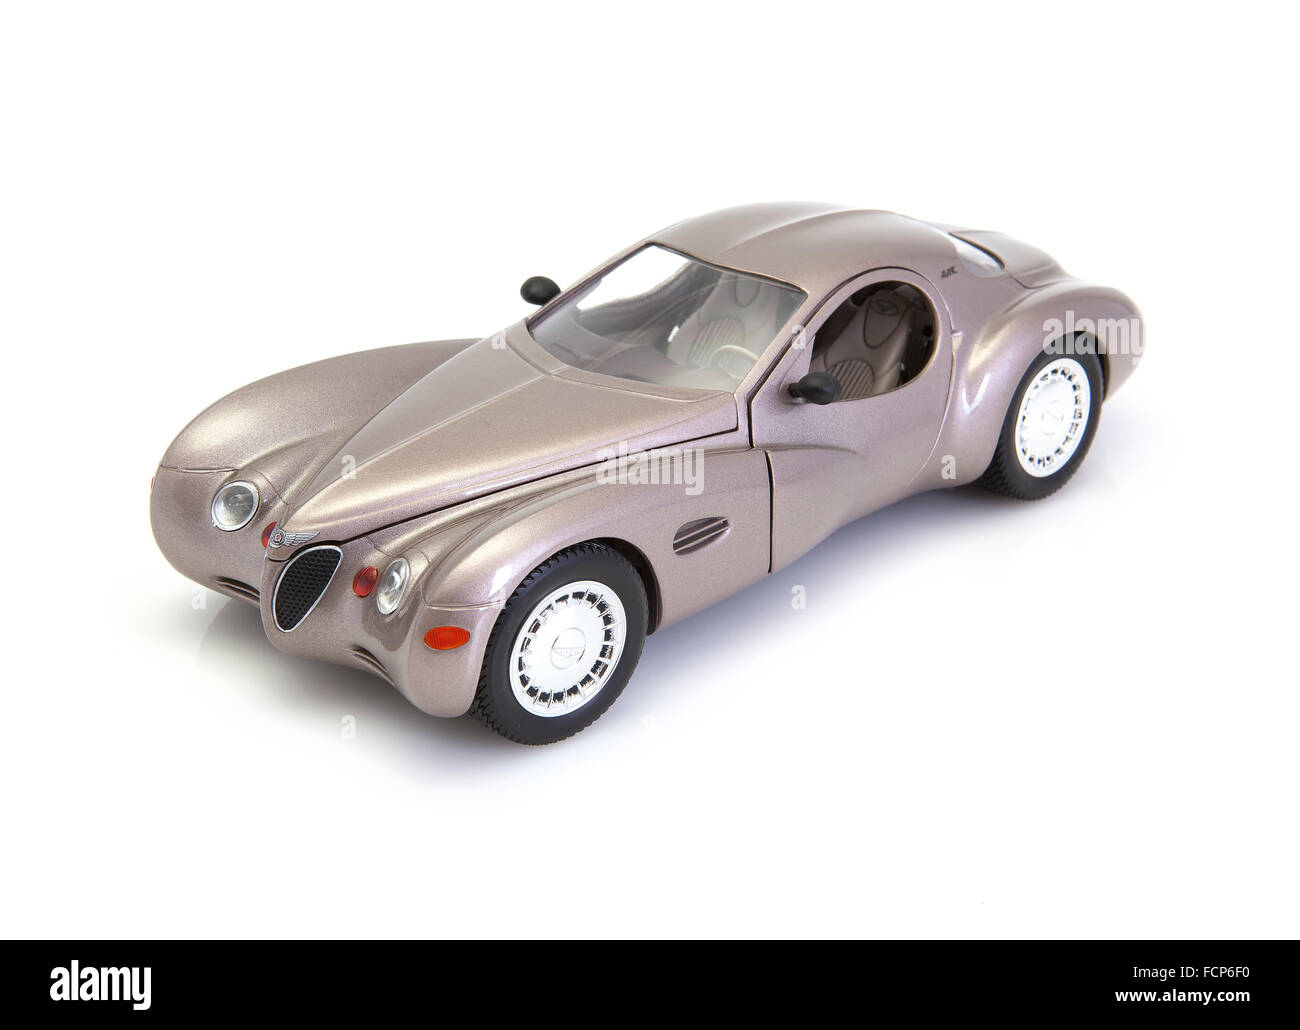 Chrysler Atlantic Concept Car Model on a White background - Stock Image